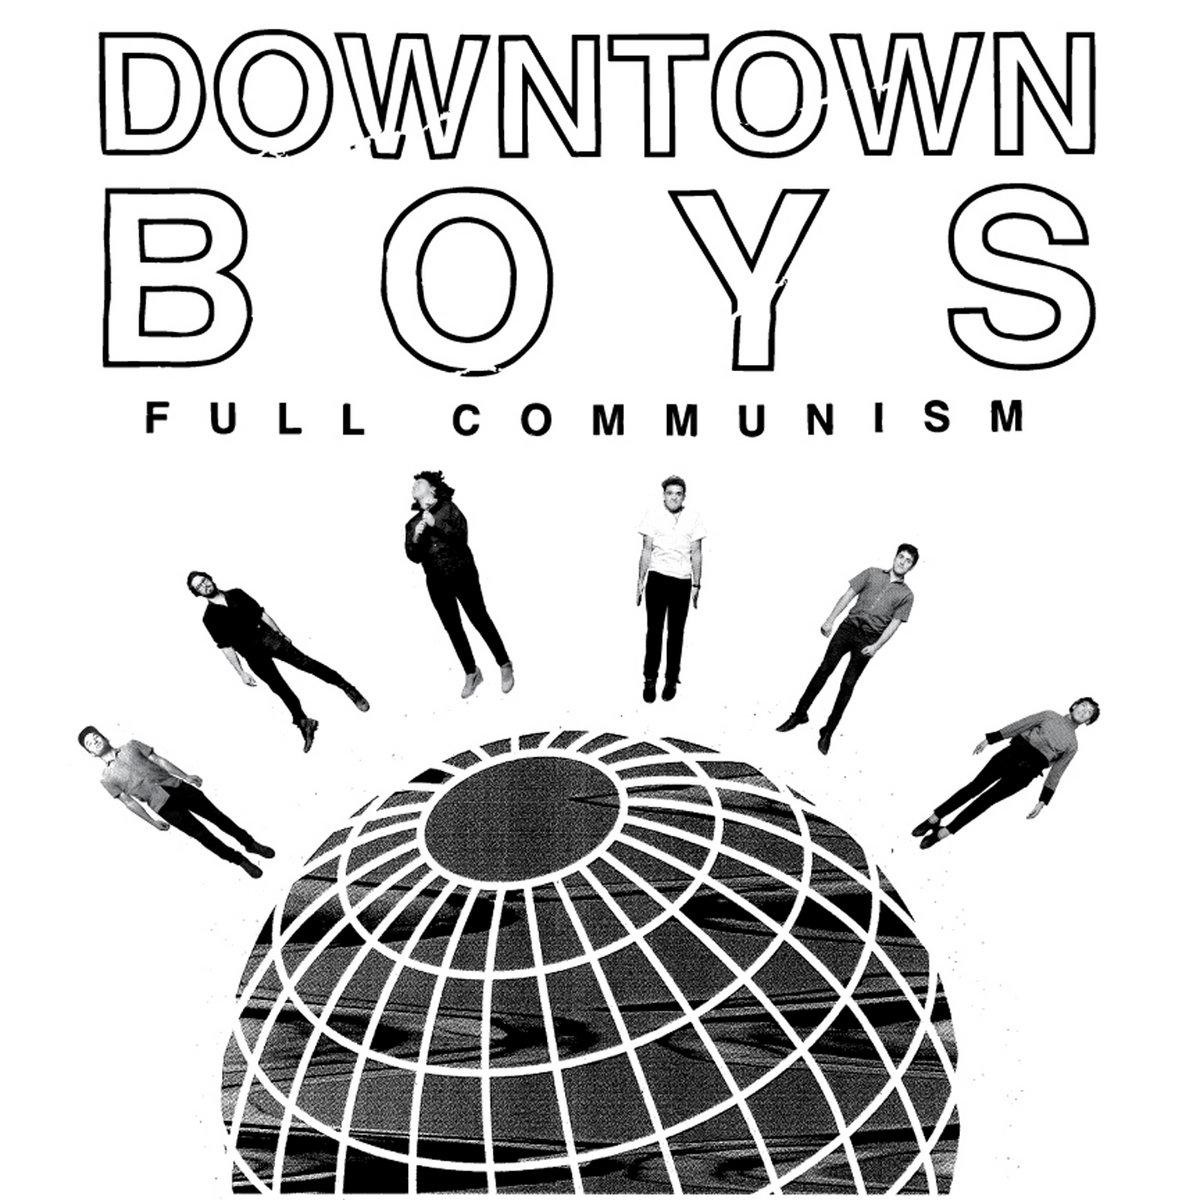 Full Communism | Downtown Boys